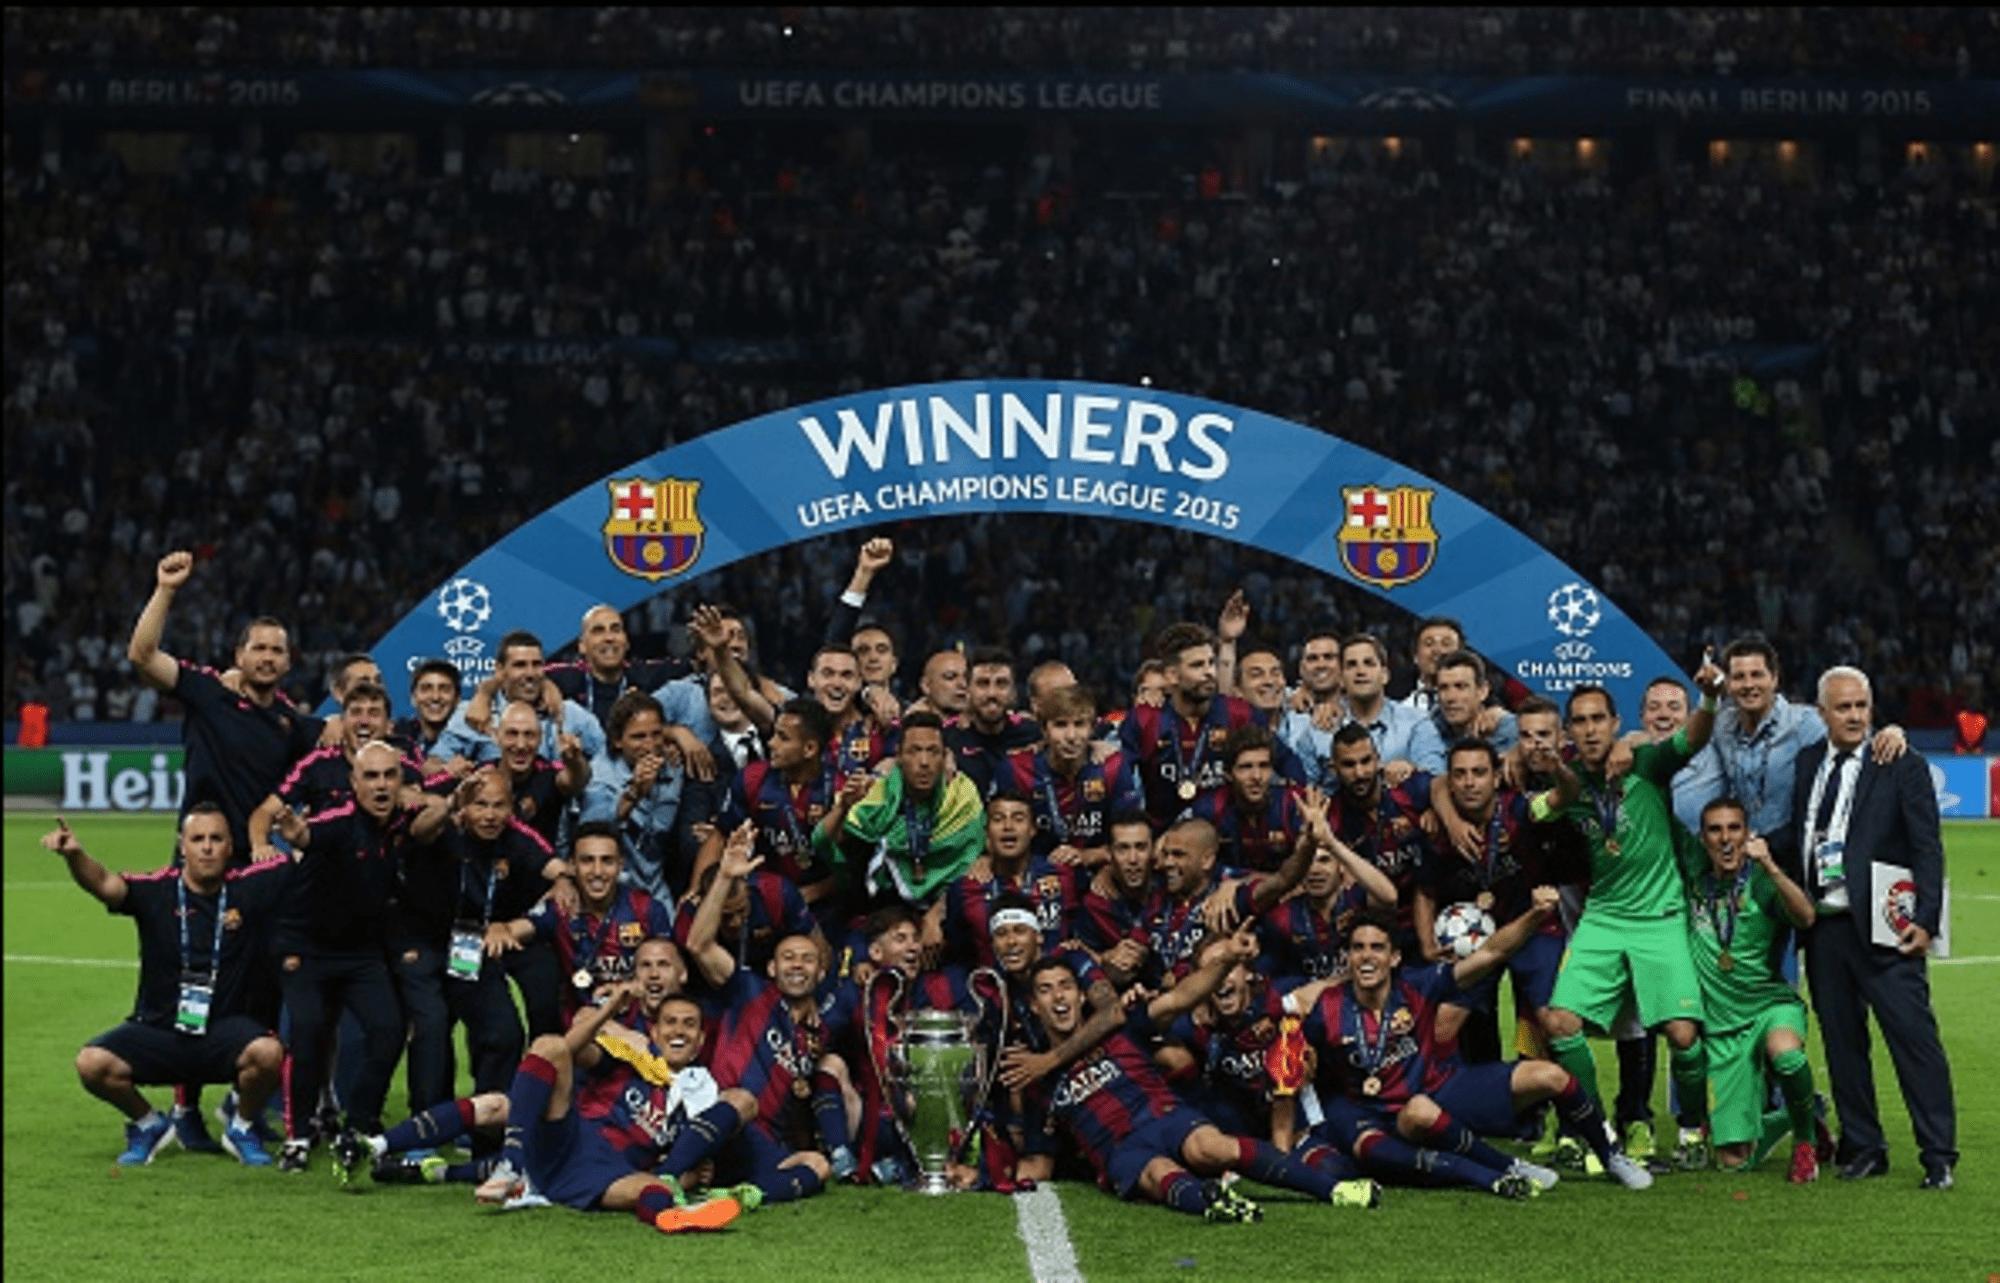 fc barcelona 2015 champions league final match ratings fc barcelona 2015 champions league